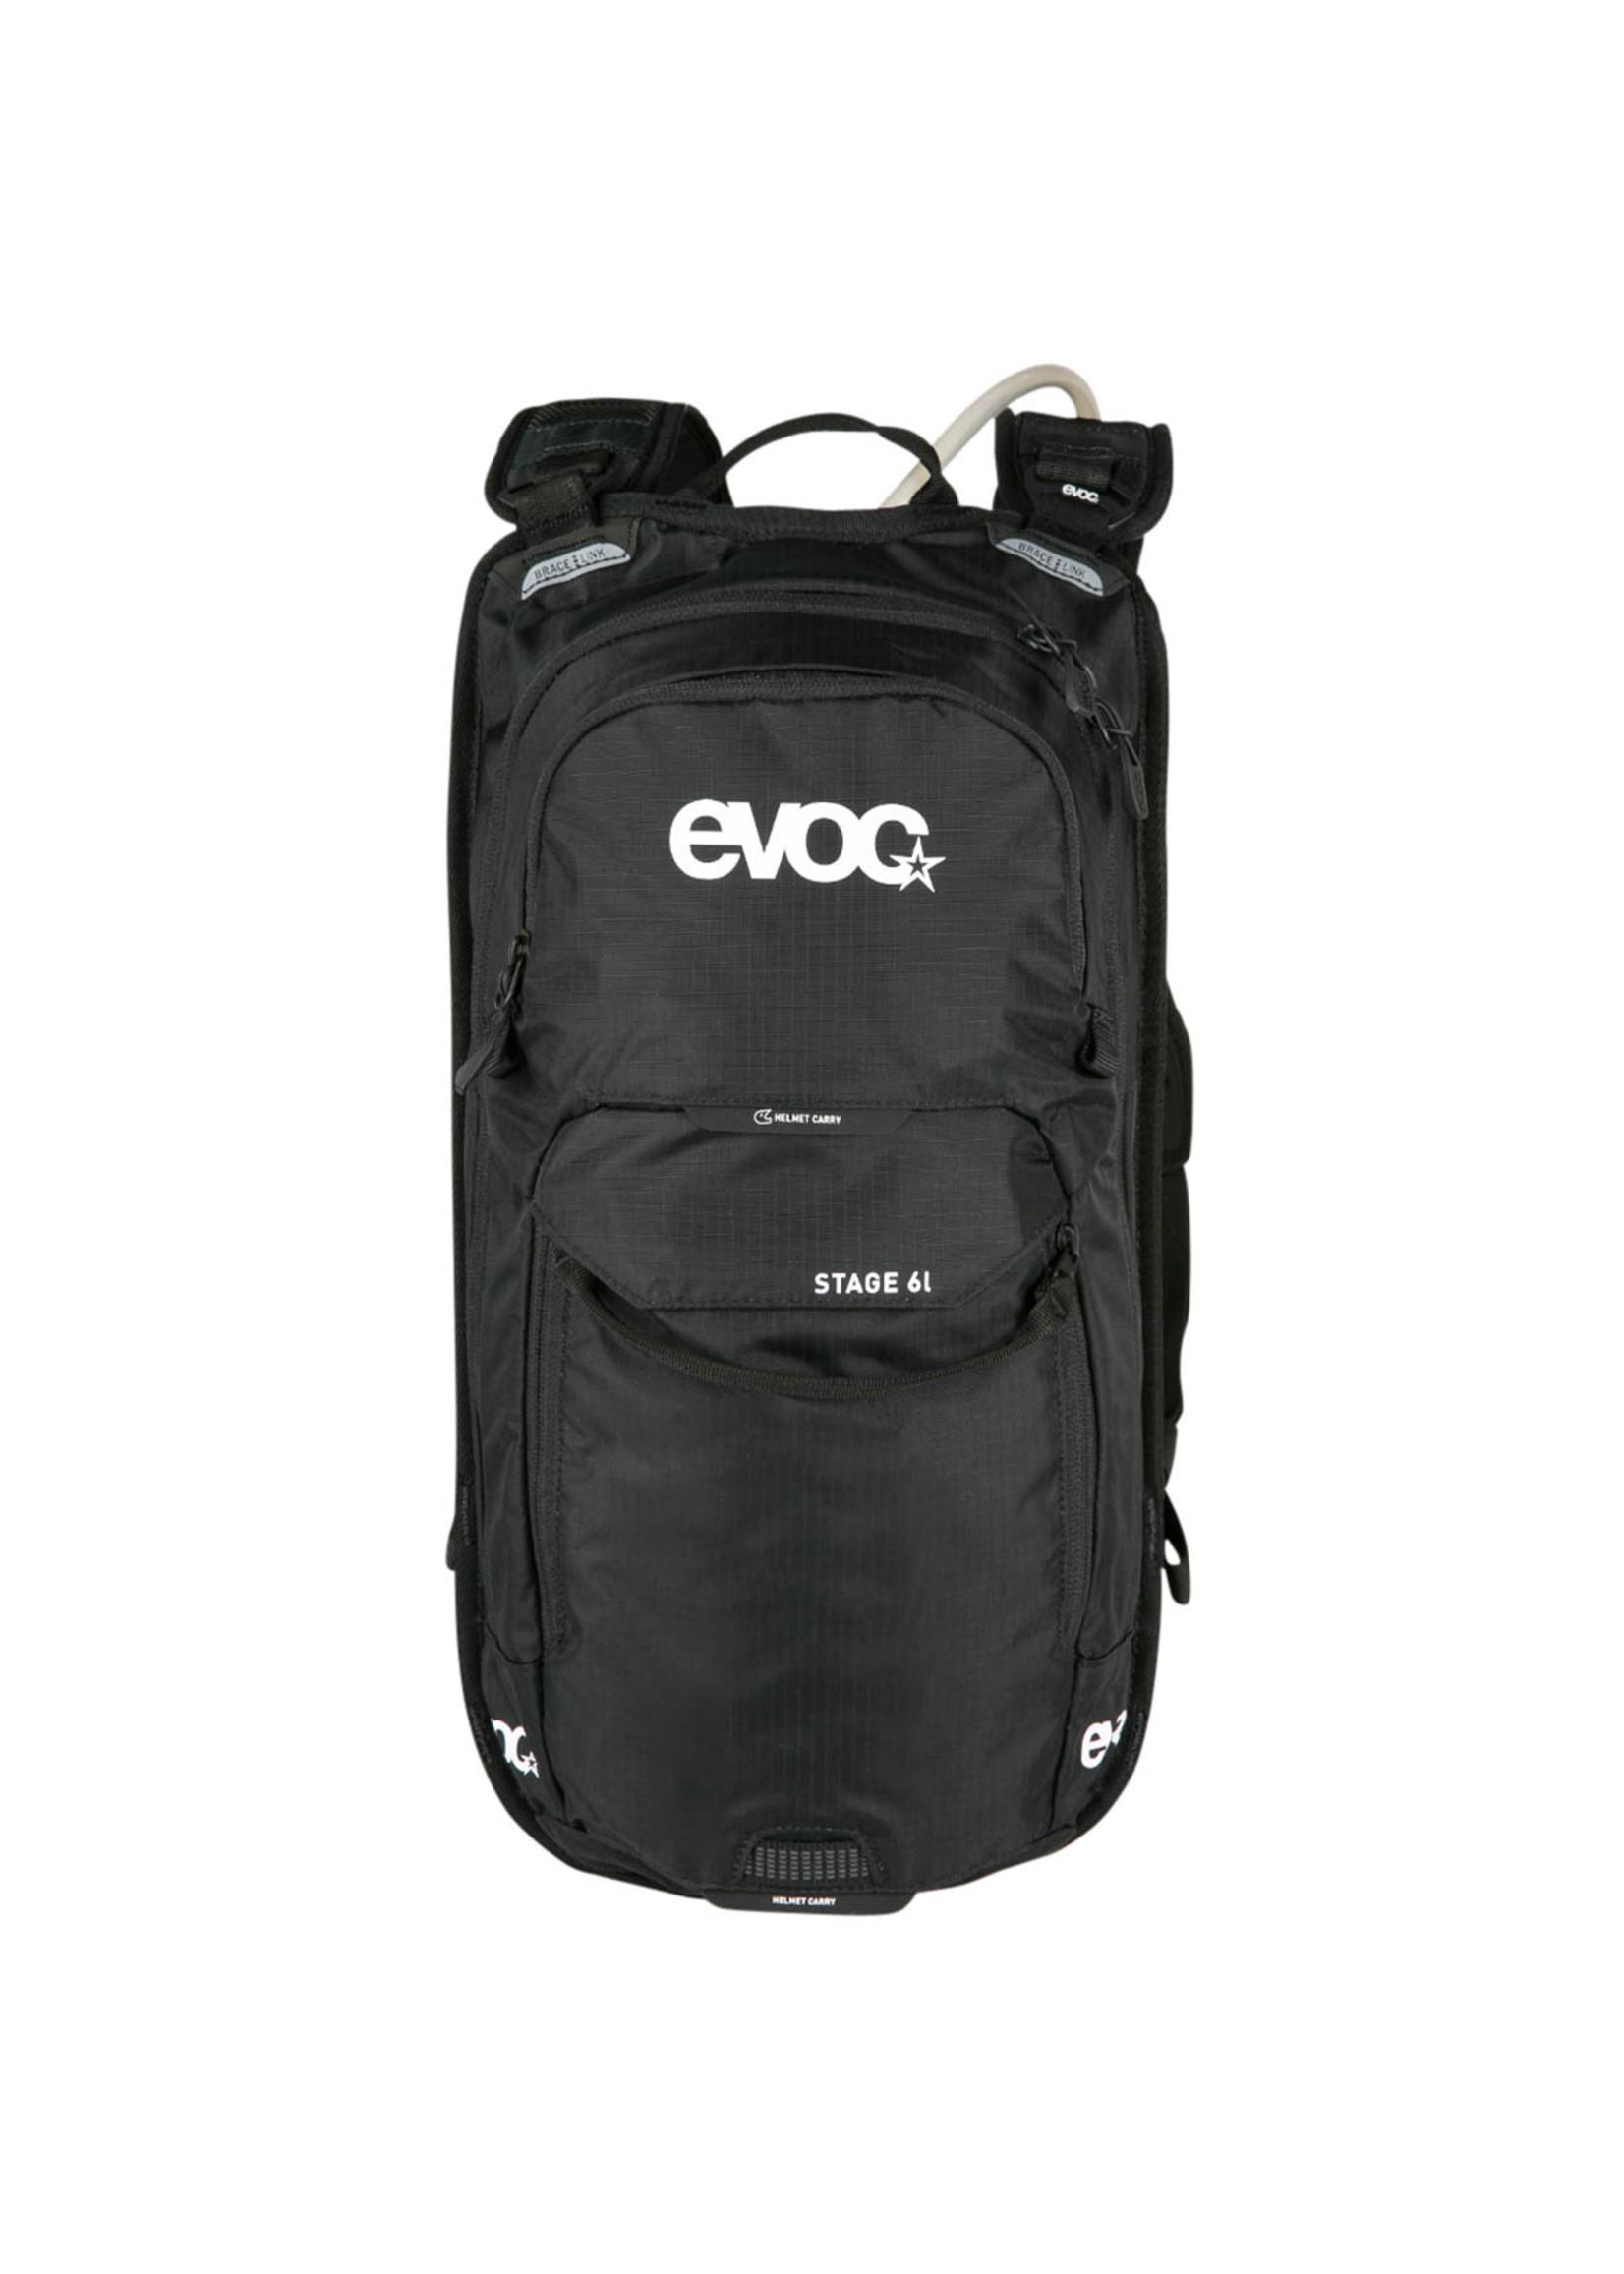 Evoc EVOC, Stage 6L Technical Perfrmance + 2L, Backpack, Black